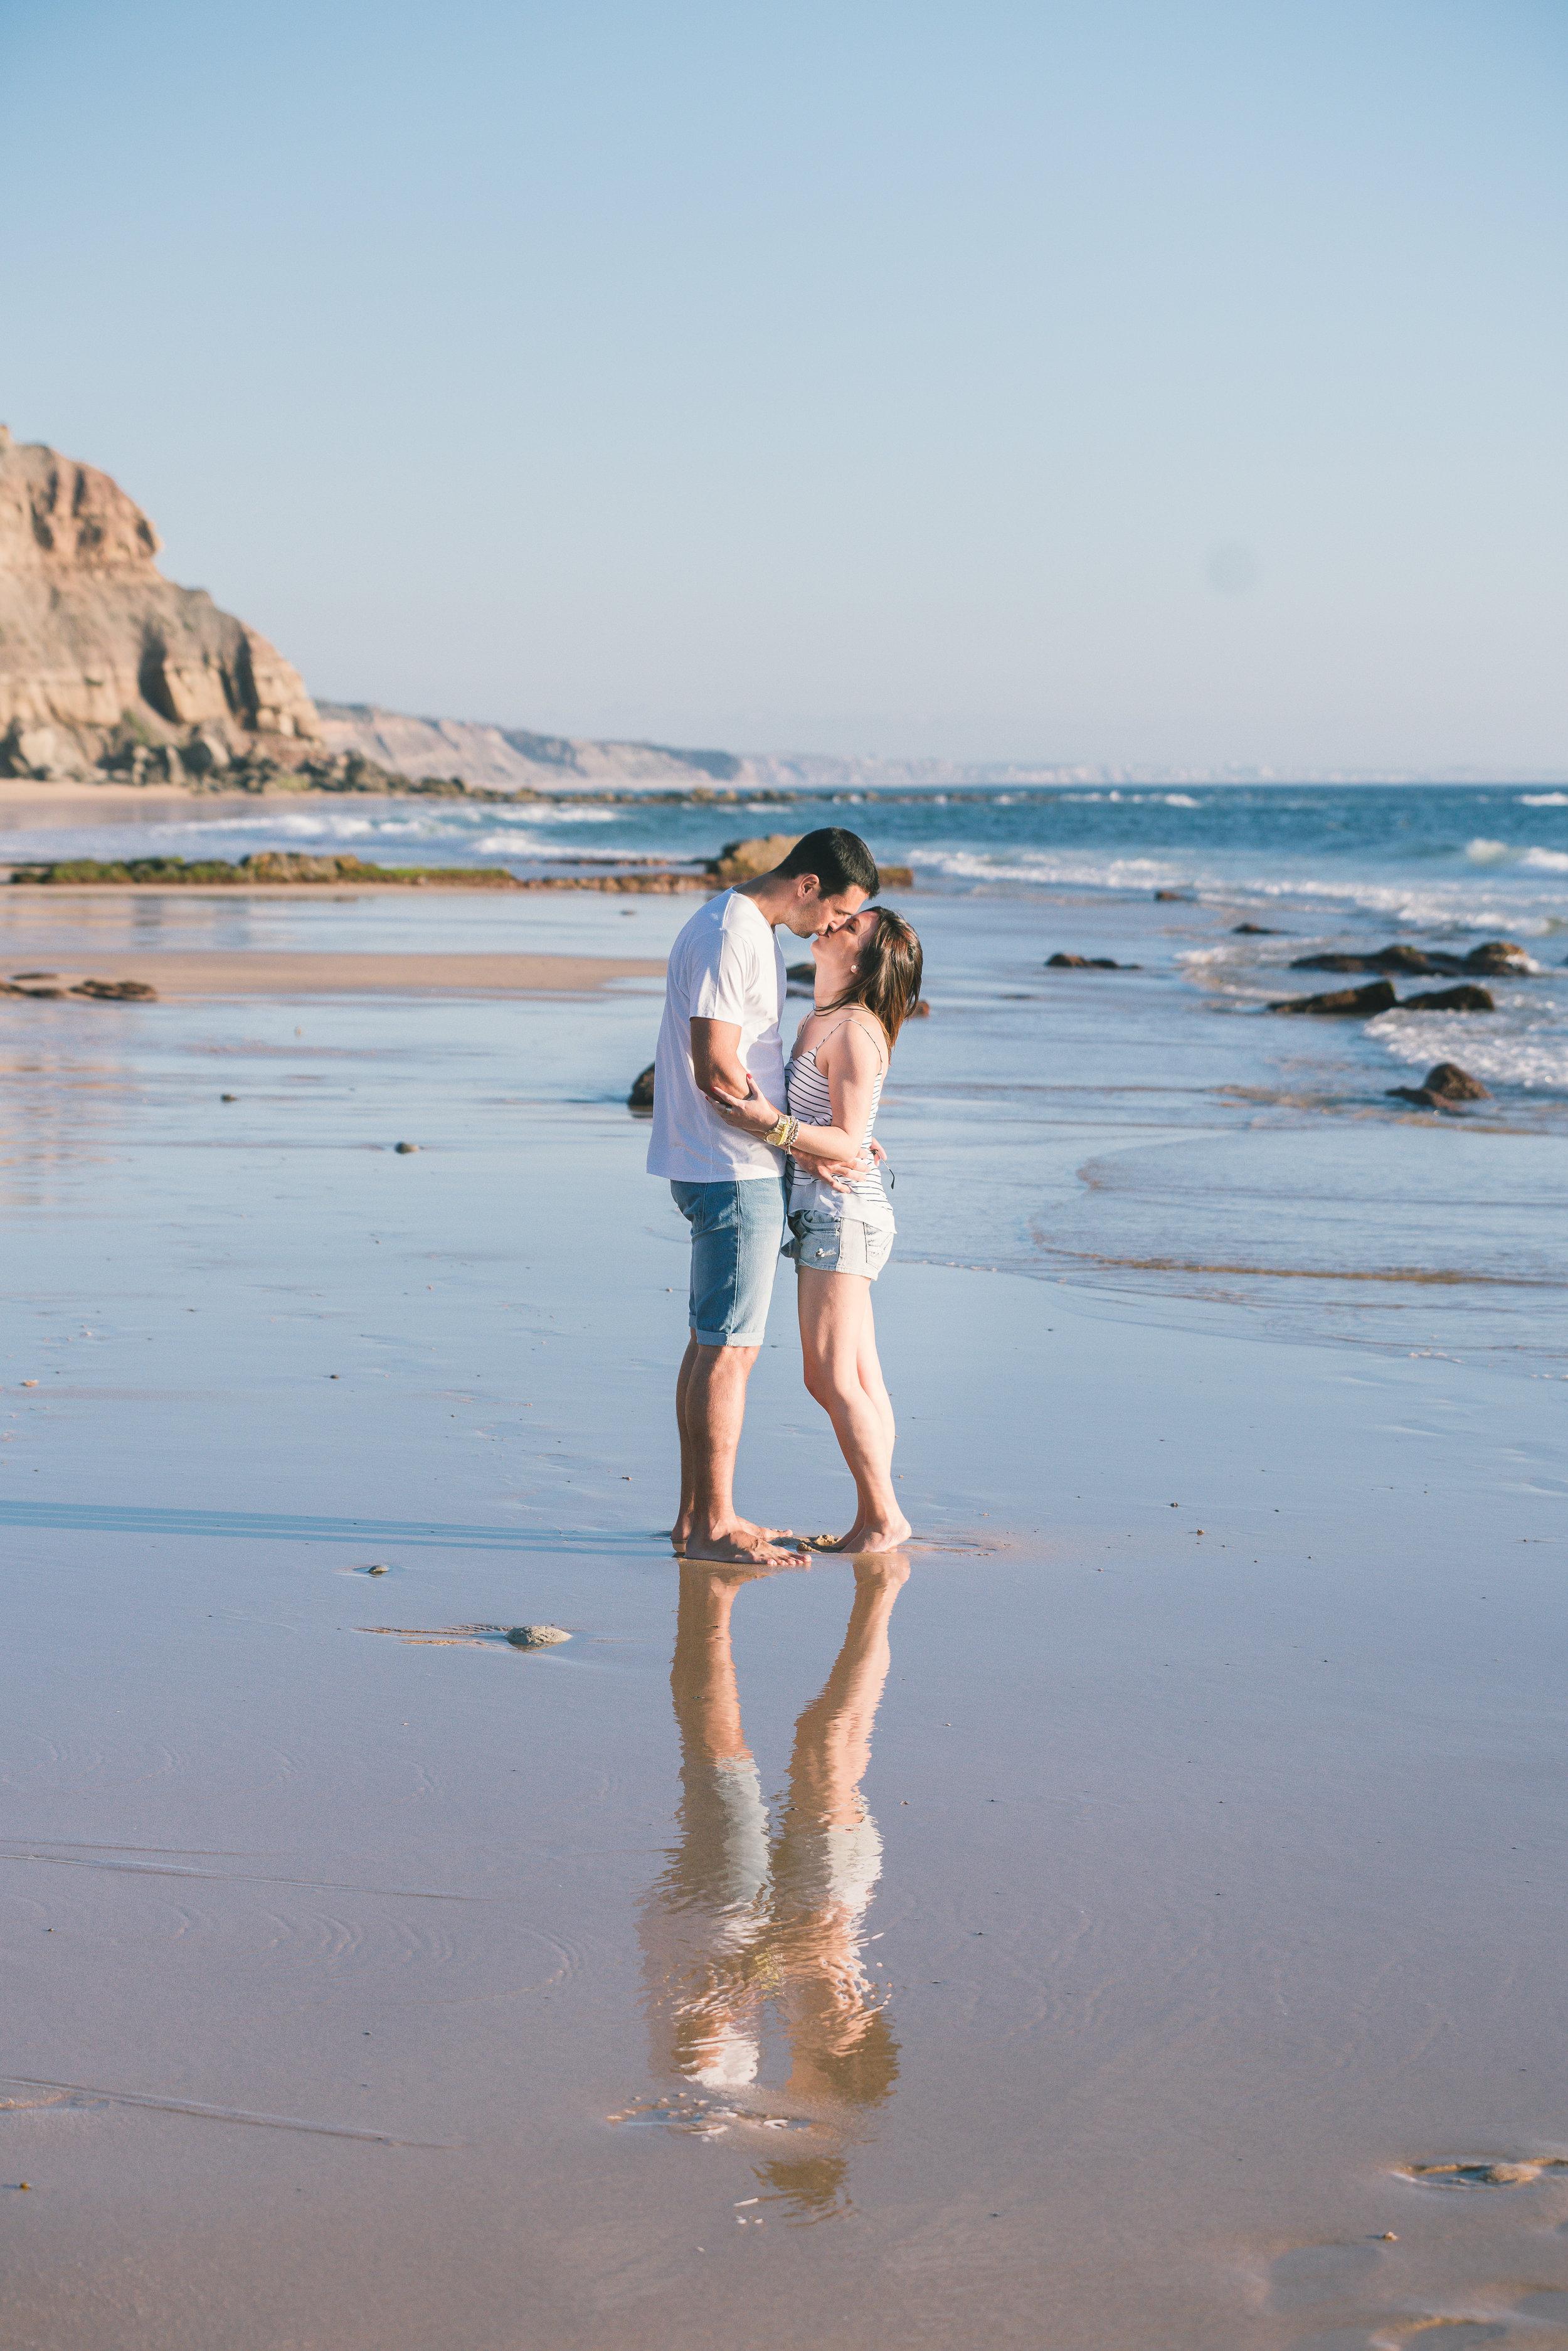 Tampa wedding photographer | Tampa wedding photography | Elopes photographer | St.Pete wedding photographer